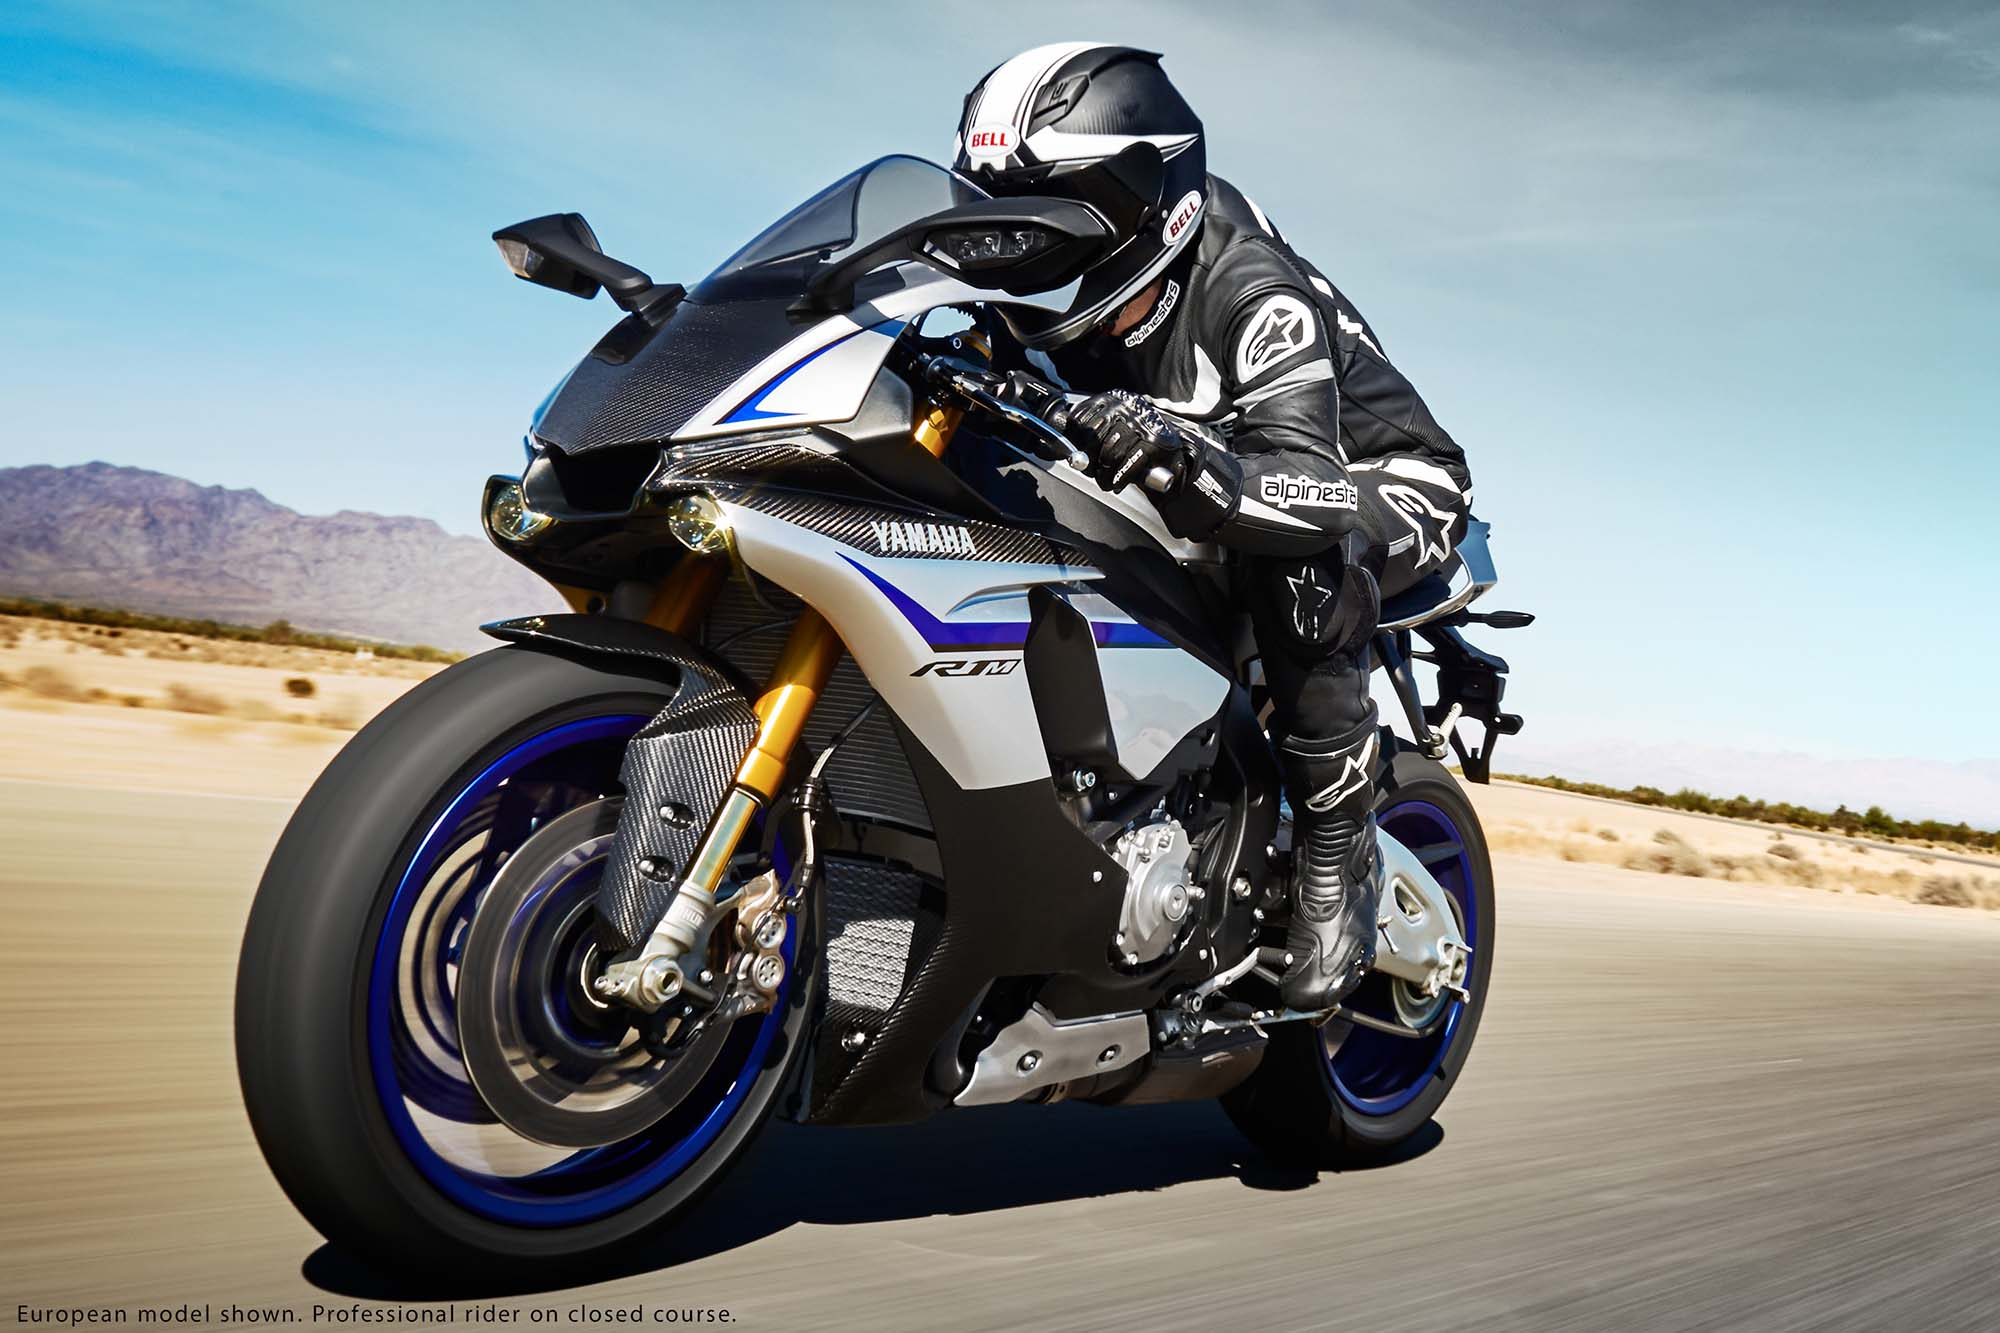 Bmw S1000rr For Sale >> 2015 Yamaha YZF-R1M - An Exclusive Track Weapon - Asphalt ...